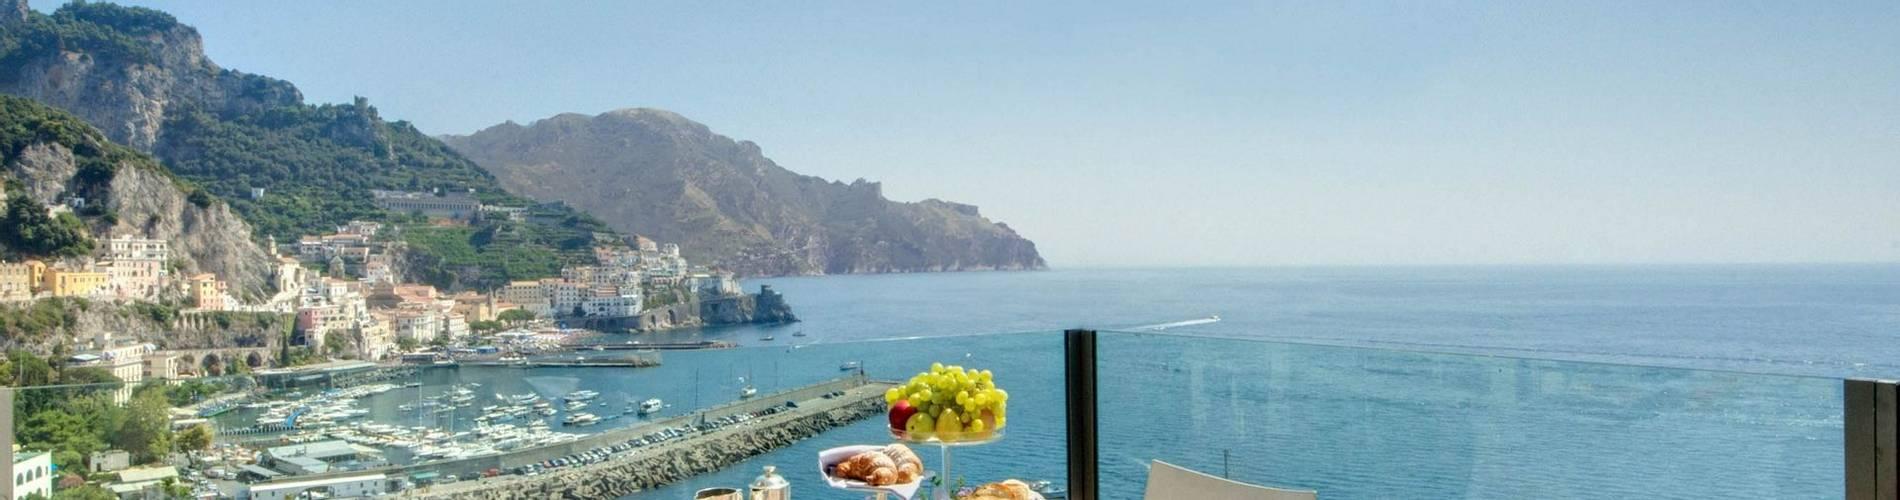 Miramalfi, Amalfi Coast, Italy (16).jpg